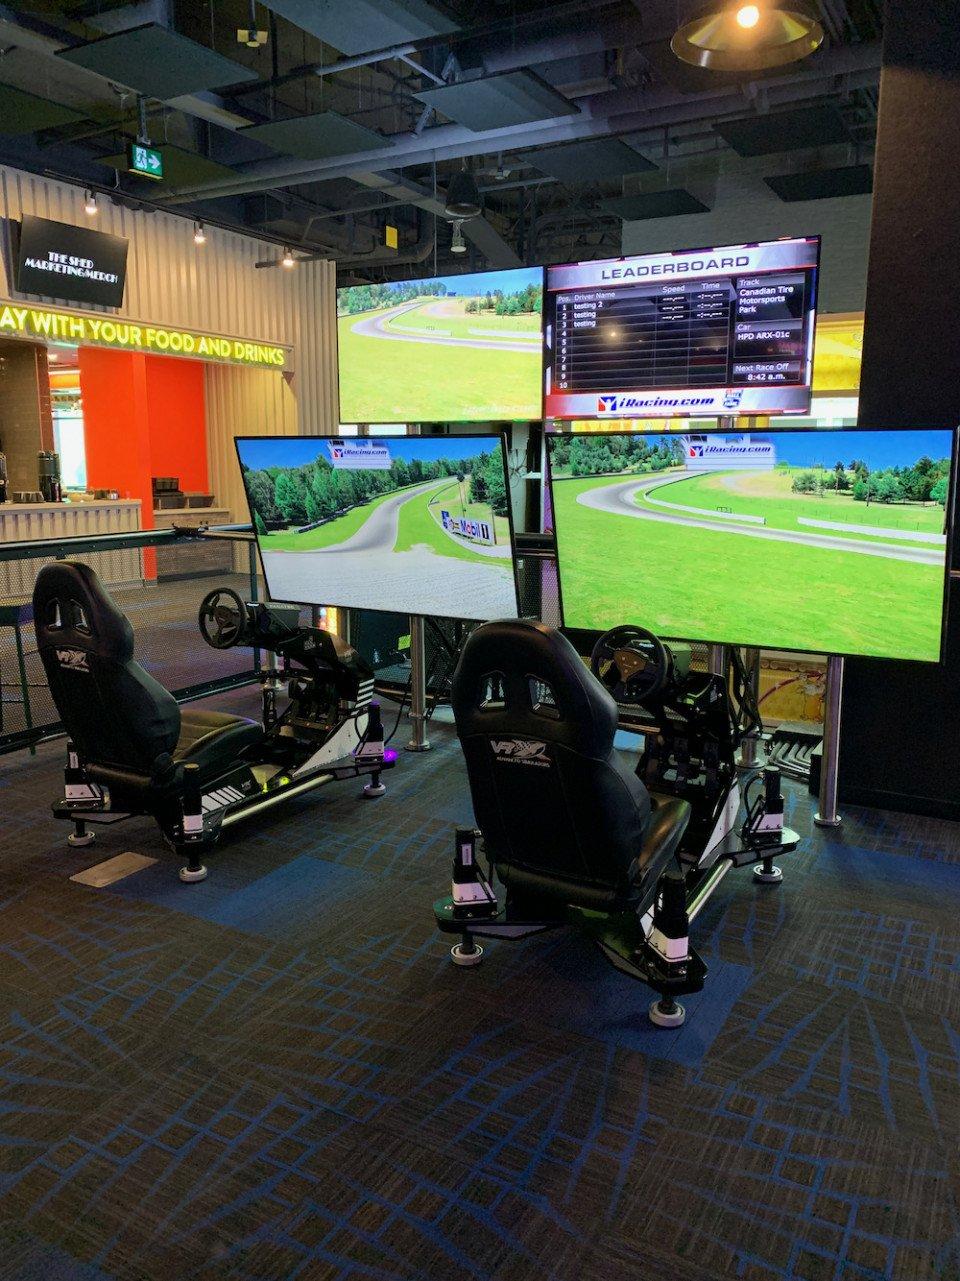 VRX motion-based car simulators at the Rec Room Burnaby.